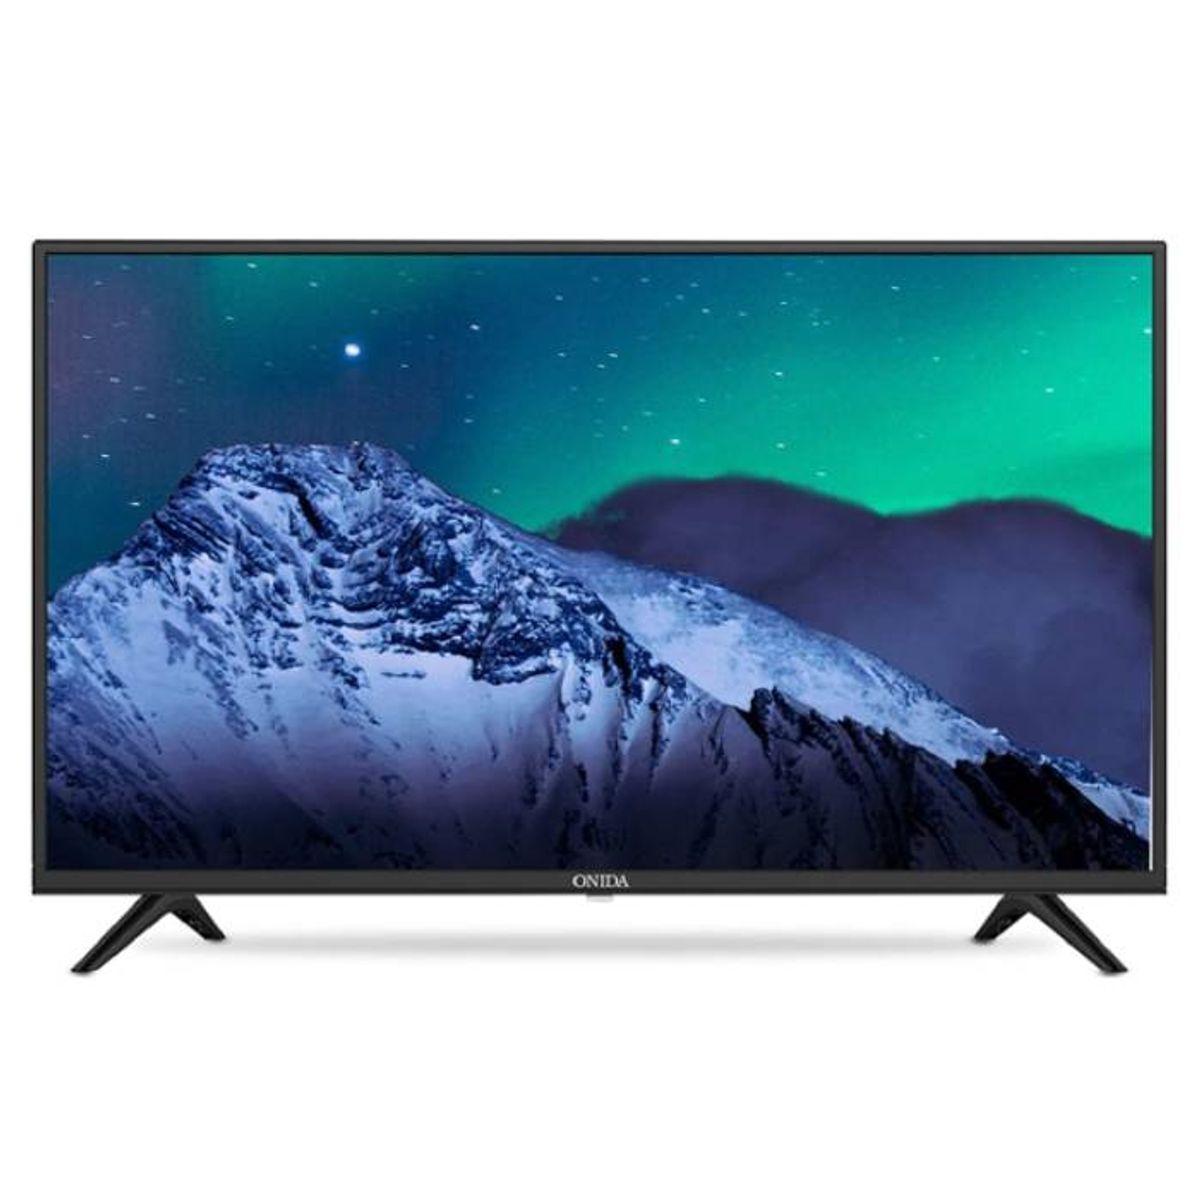 ओनिडा 32 Inches HD Ready Smart IPS LED TV(Fire टीवी Edition)